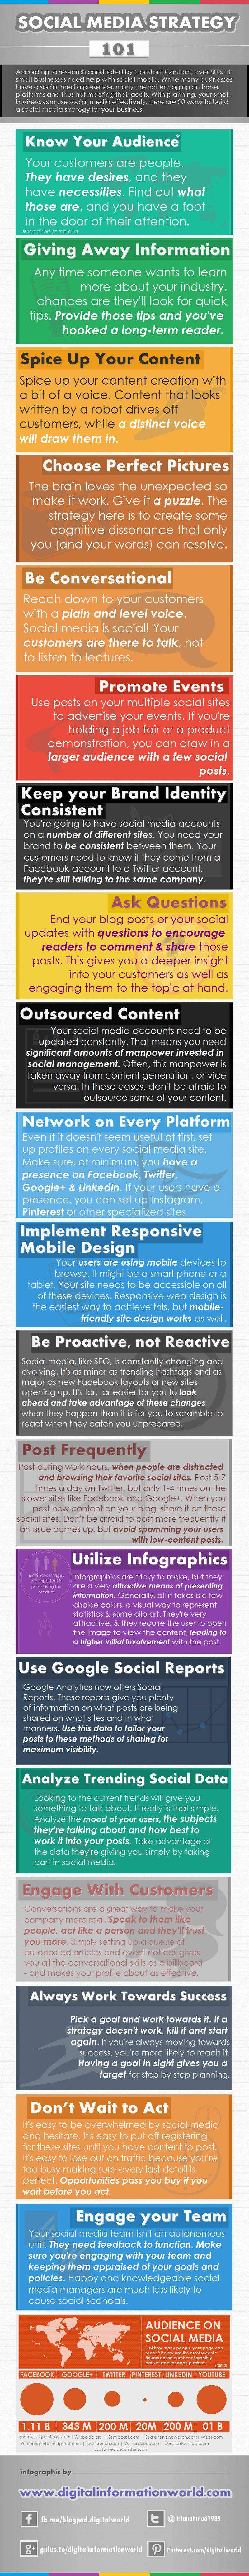 Social-Media-Strategy-Tips